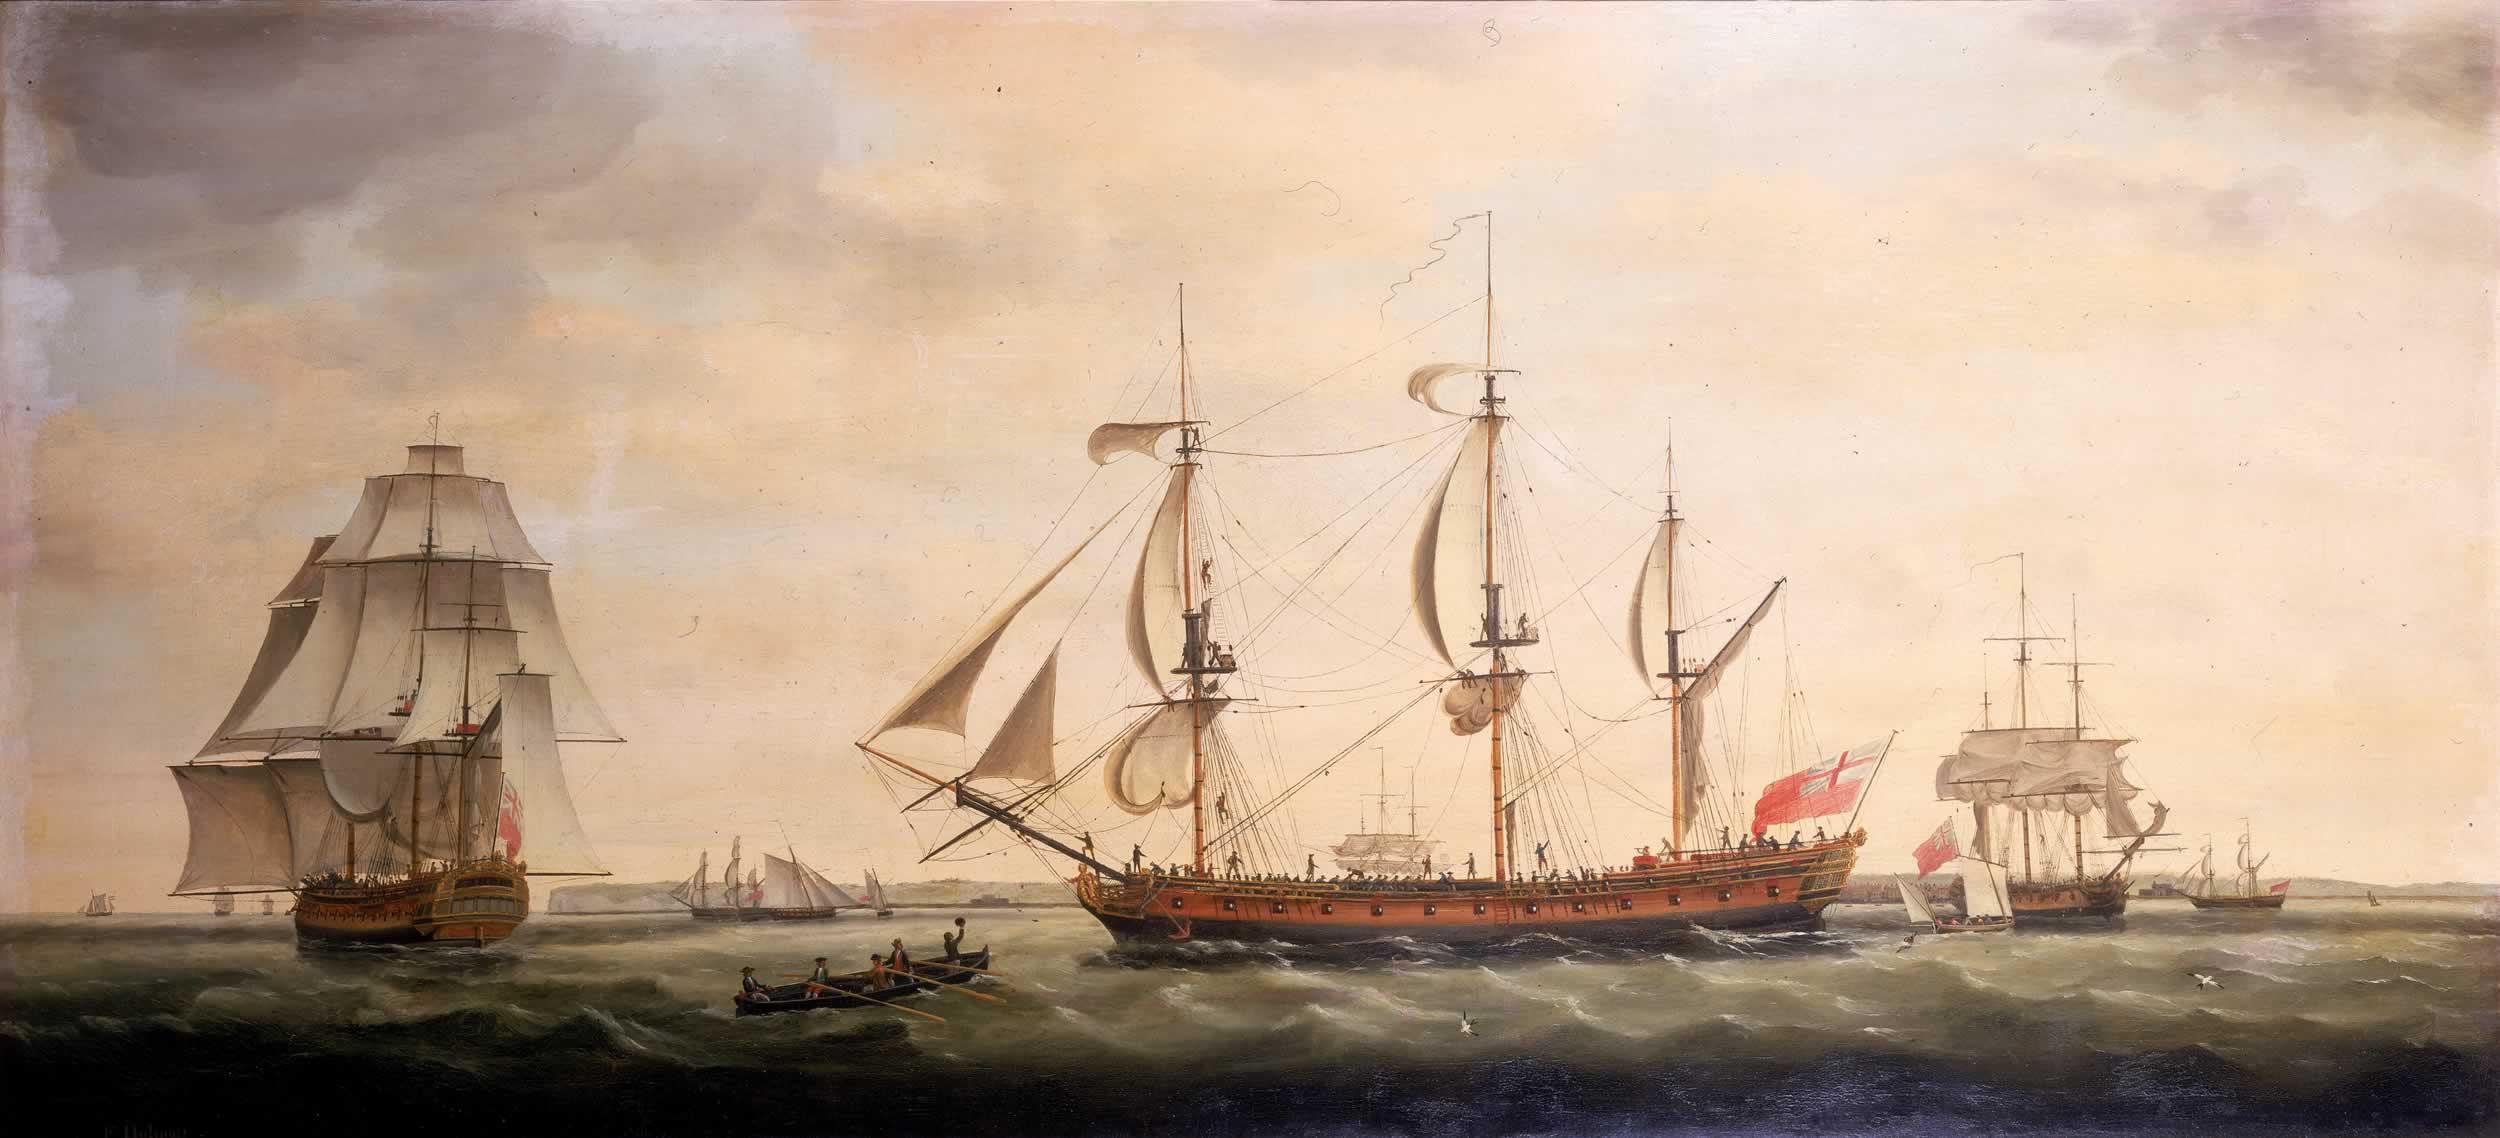 Royal George (East Indiaman) - Wikipedia